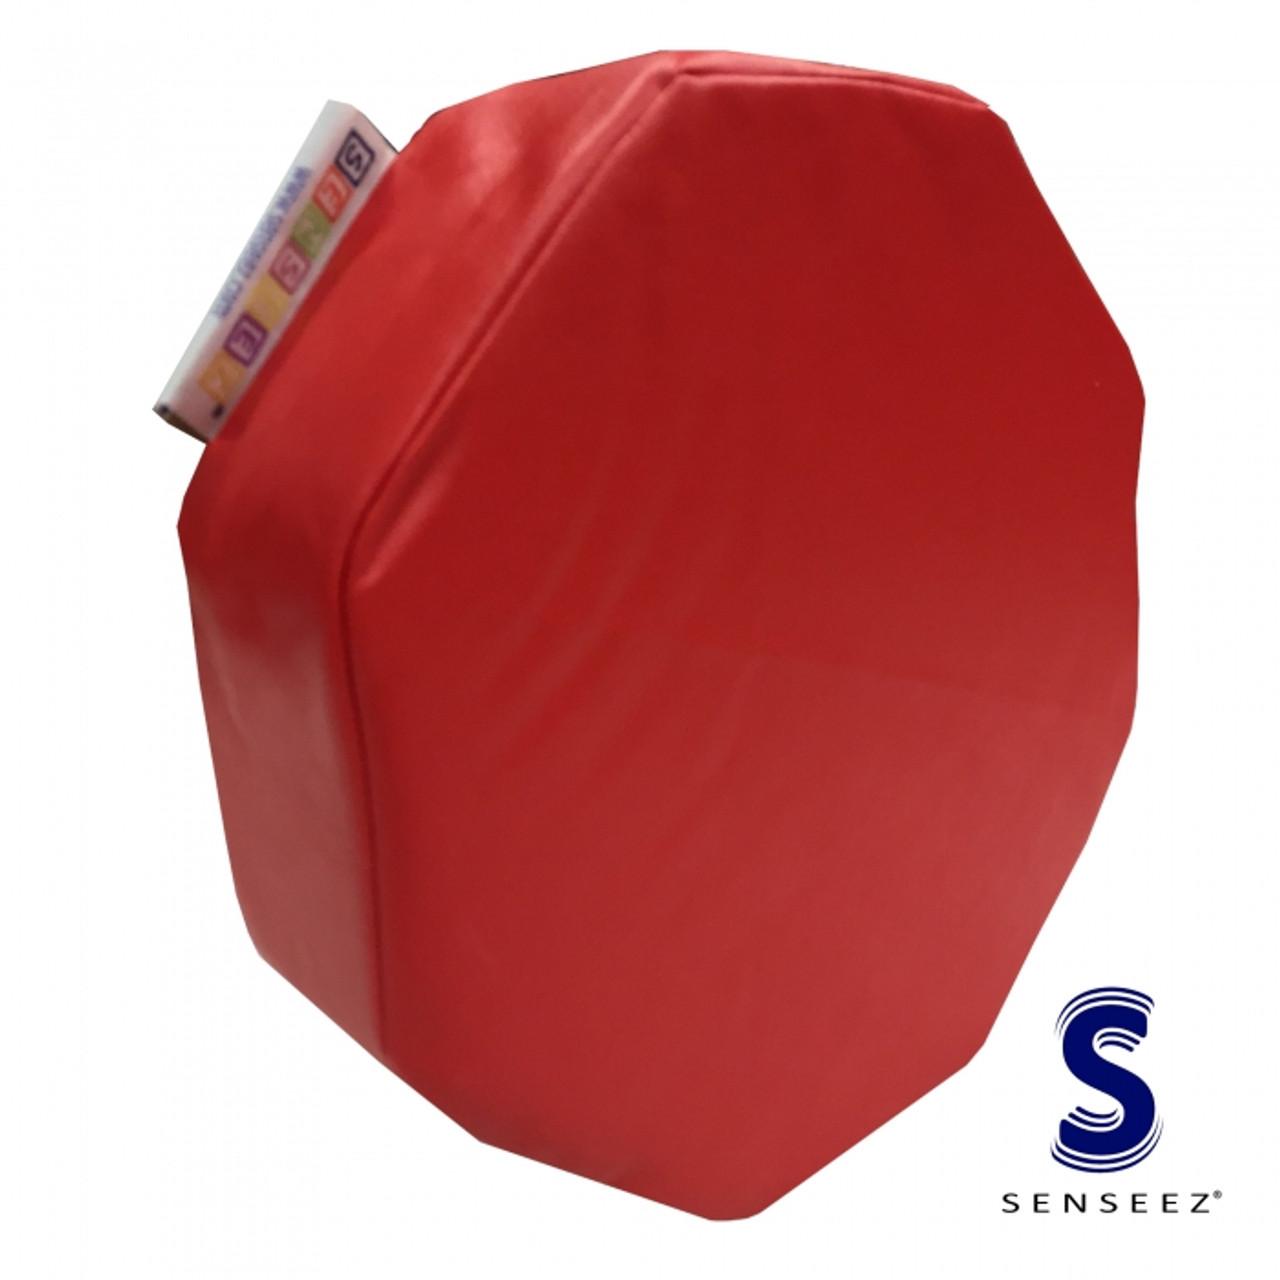 Senseez Vibrating Pillow Red Octagon